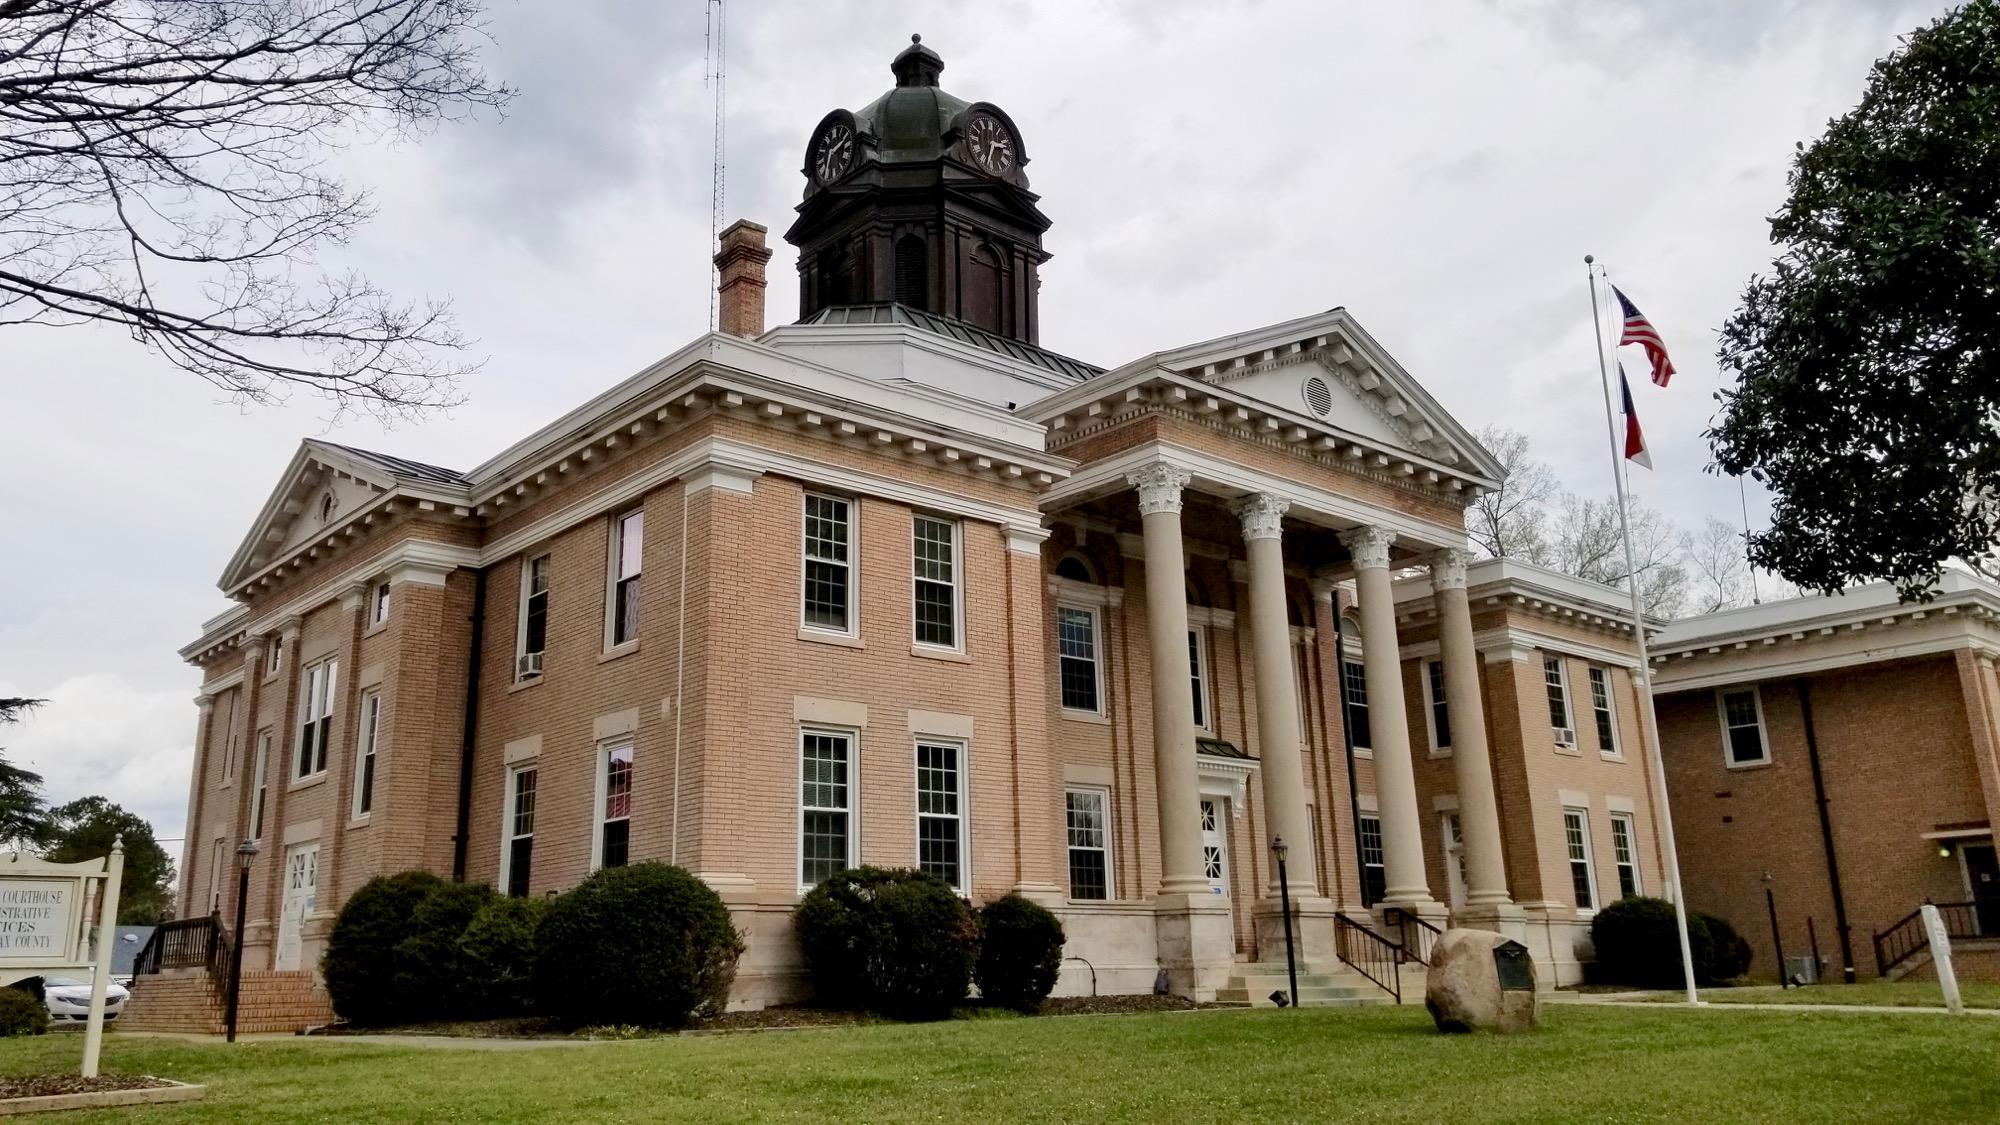 File:Halifax County Courthouse NC jpg - Wikimedia Commons